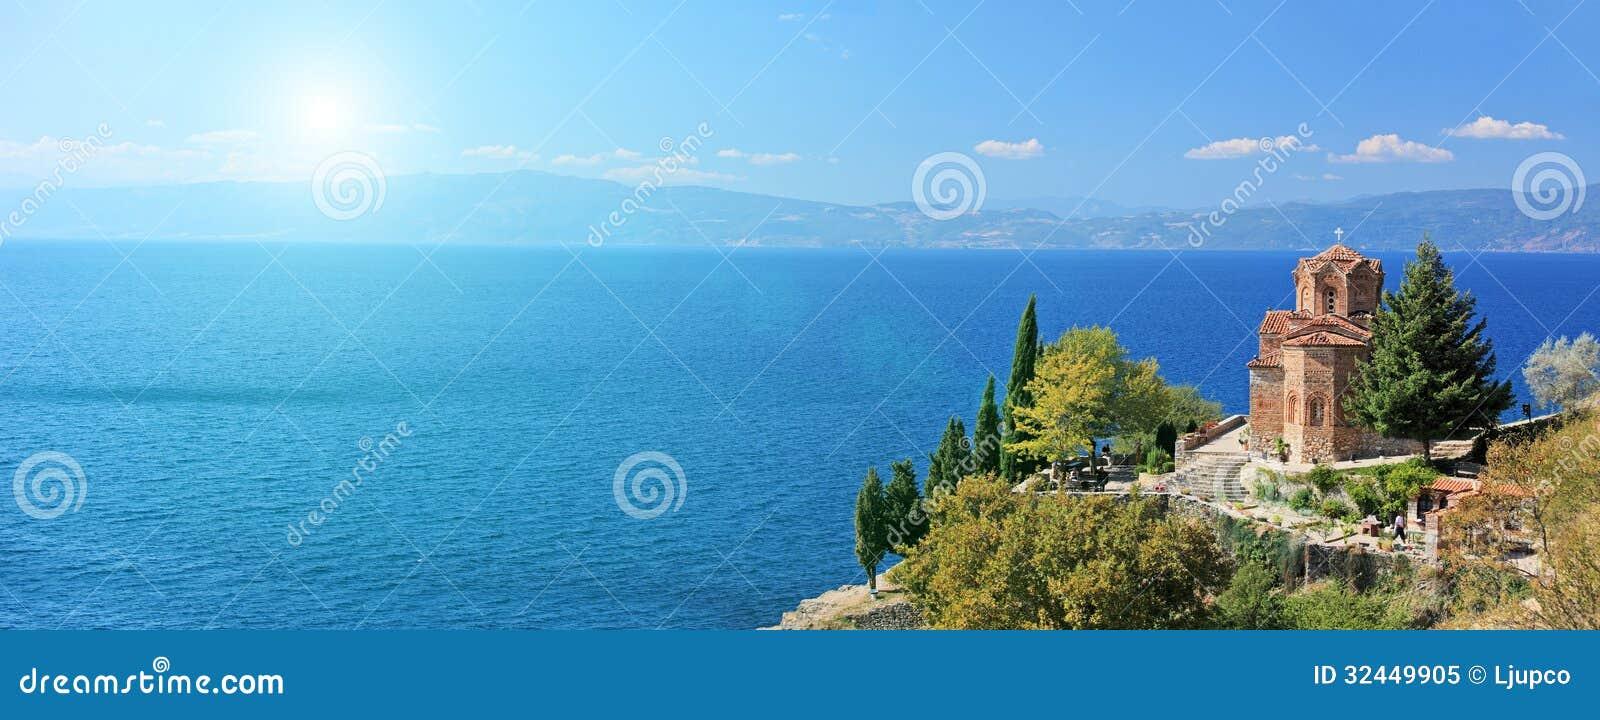 St. Jovan Kaneo church overlooking Ohrid lake, Macedonia on a sunny day